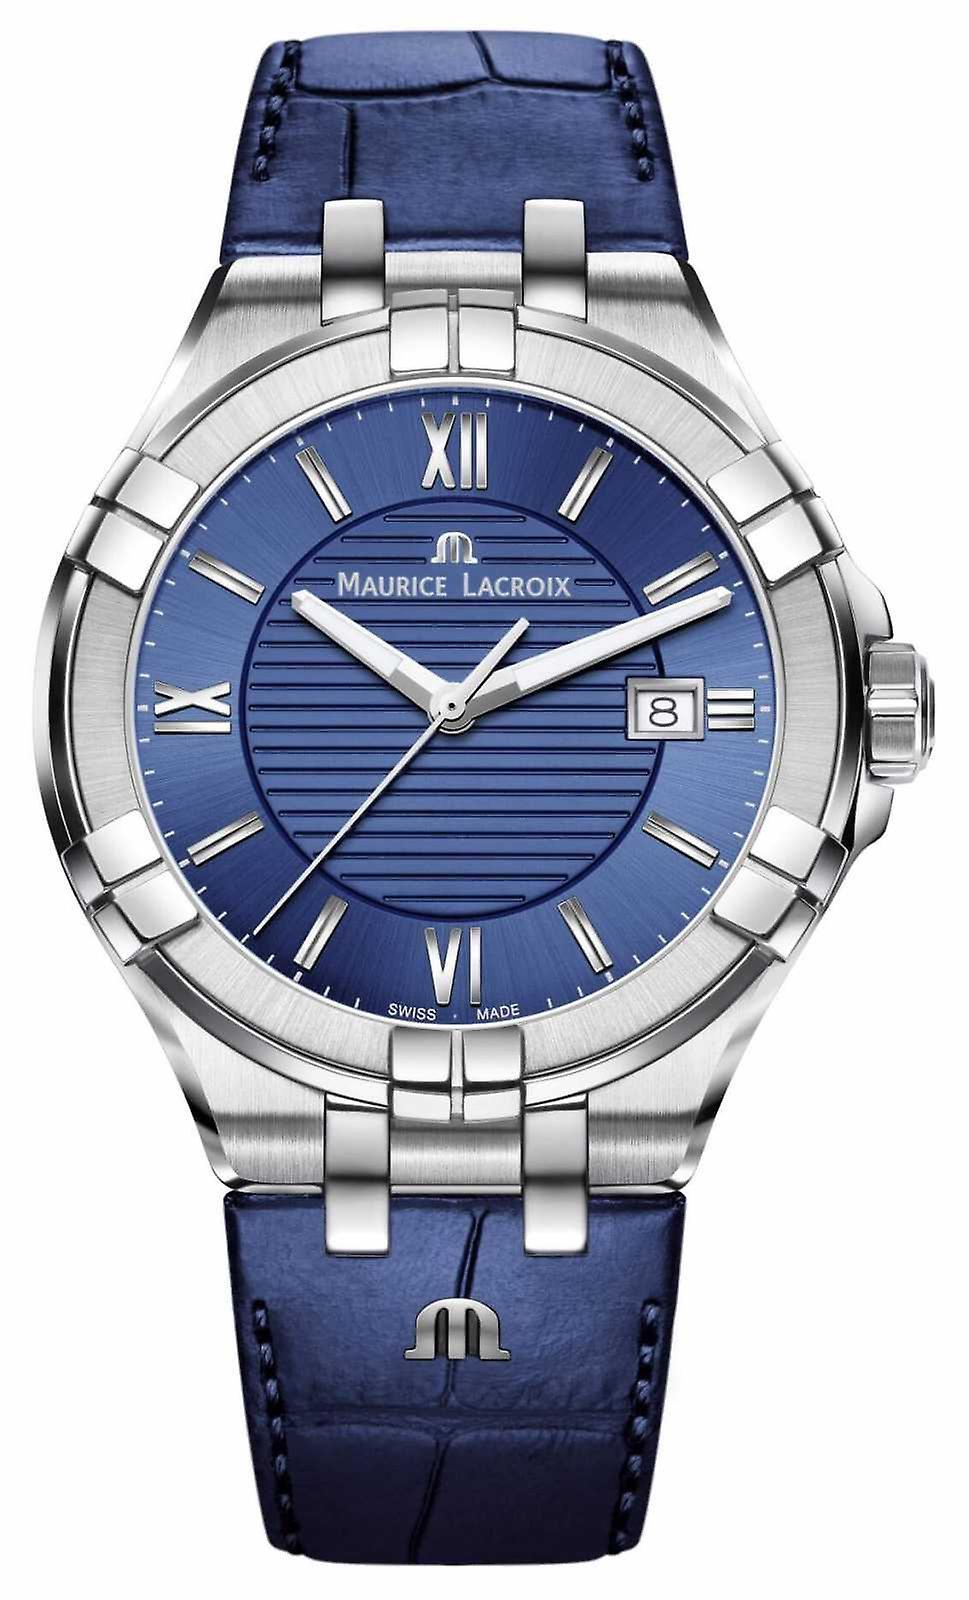 Maurice Lacroix Aikon Mens Blue Dial Blue Leather Strap AI1008-SS001-430-1 Watch